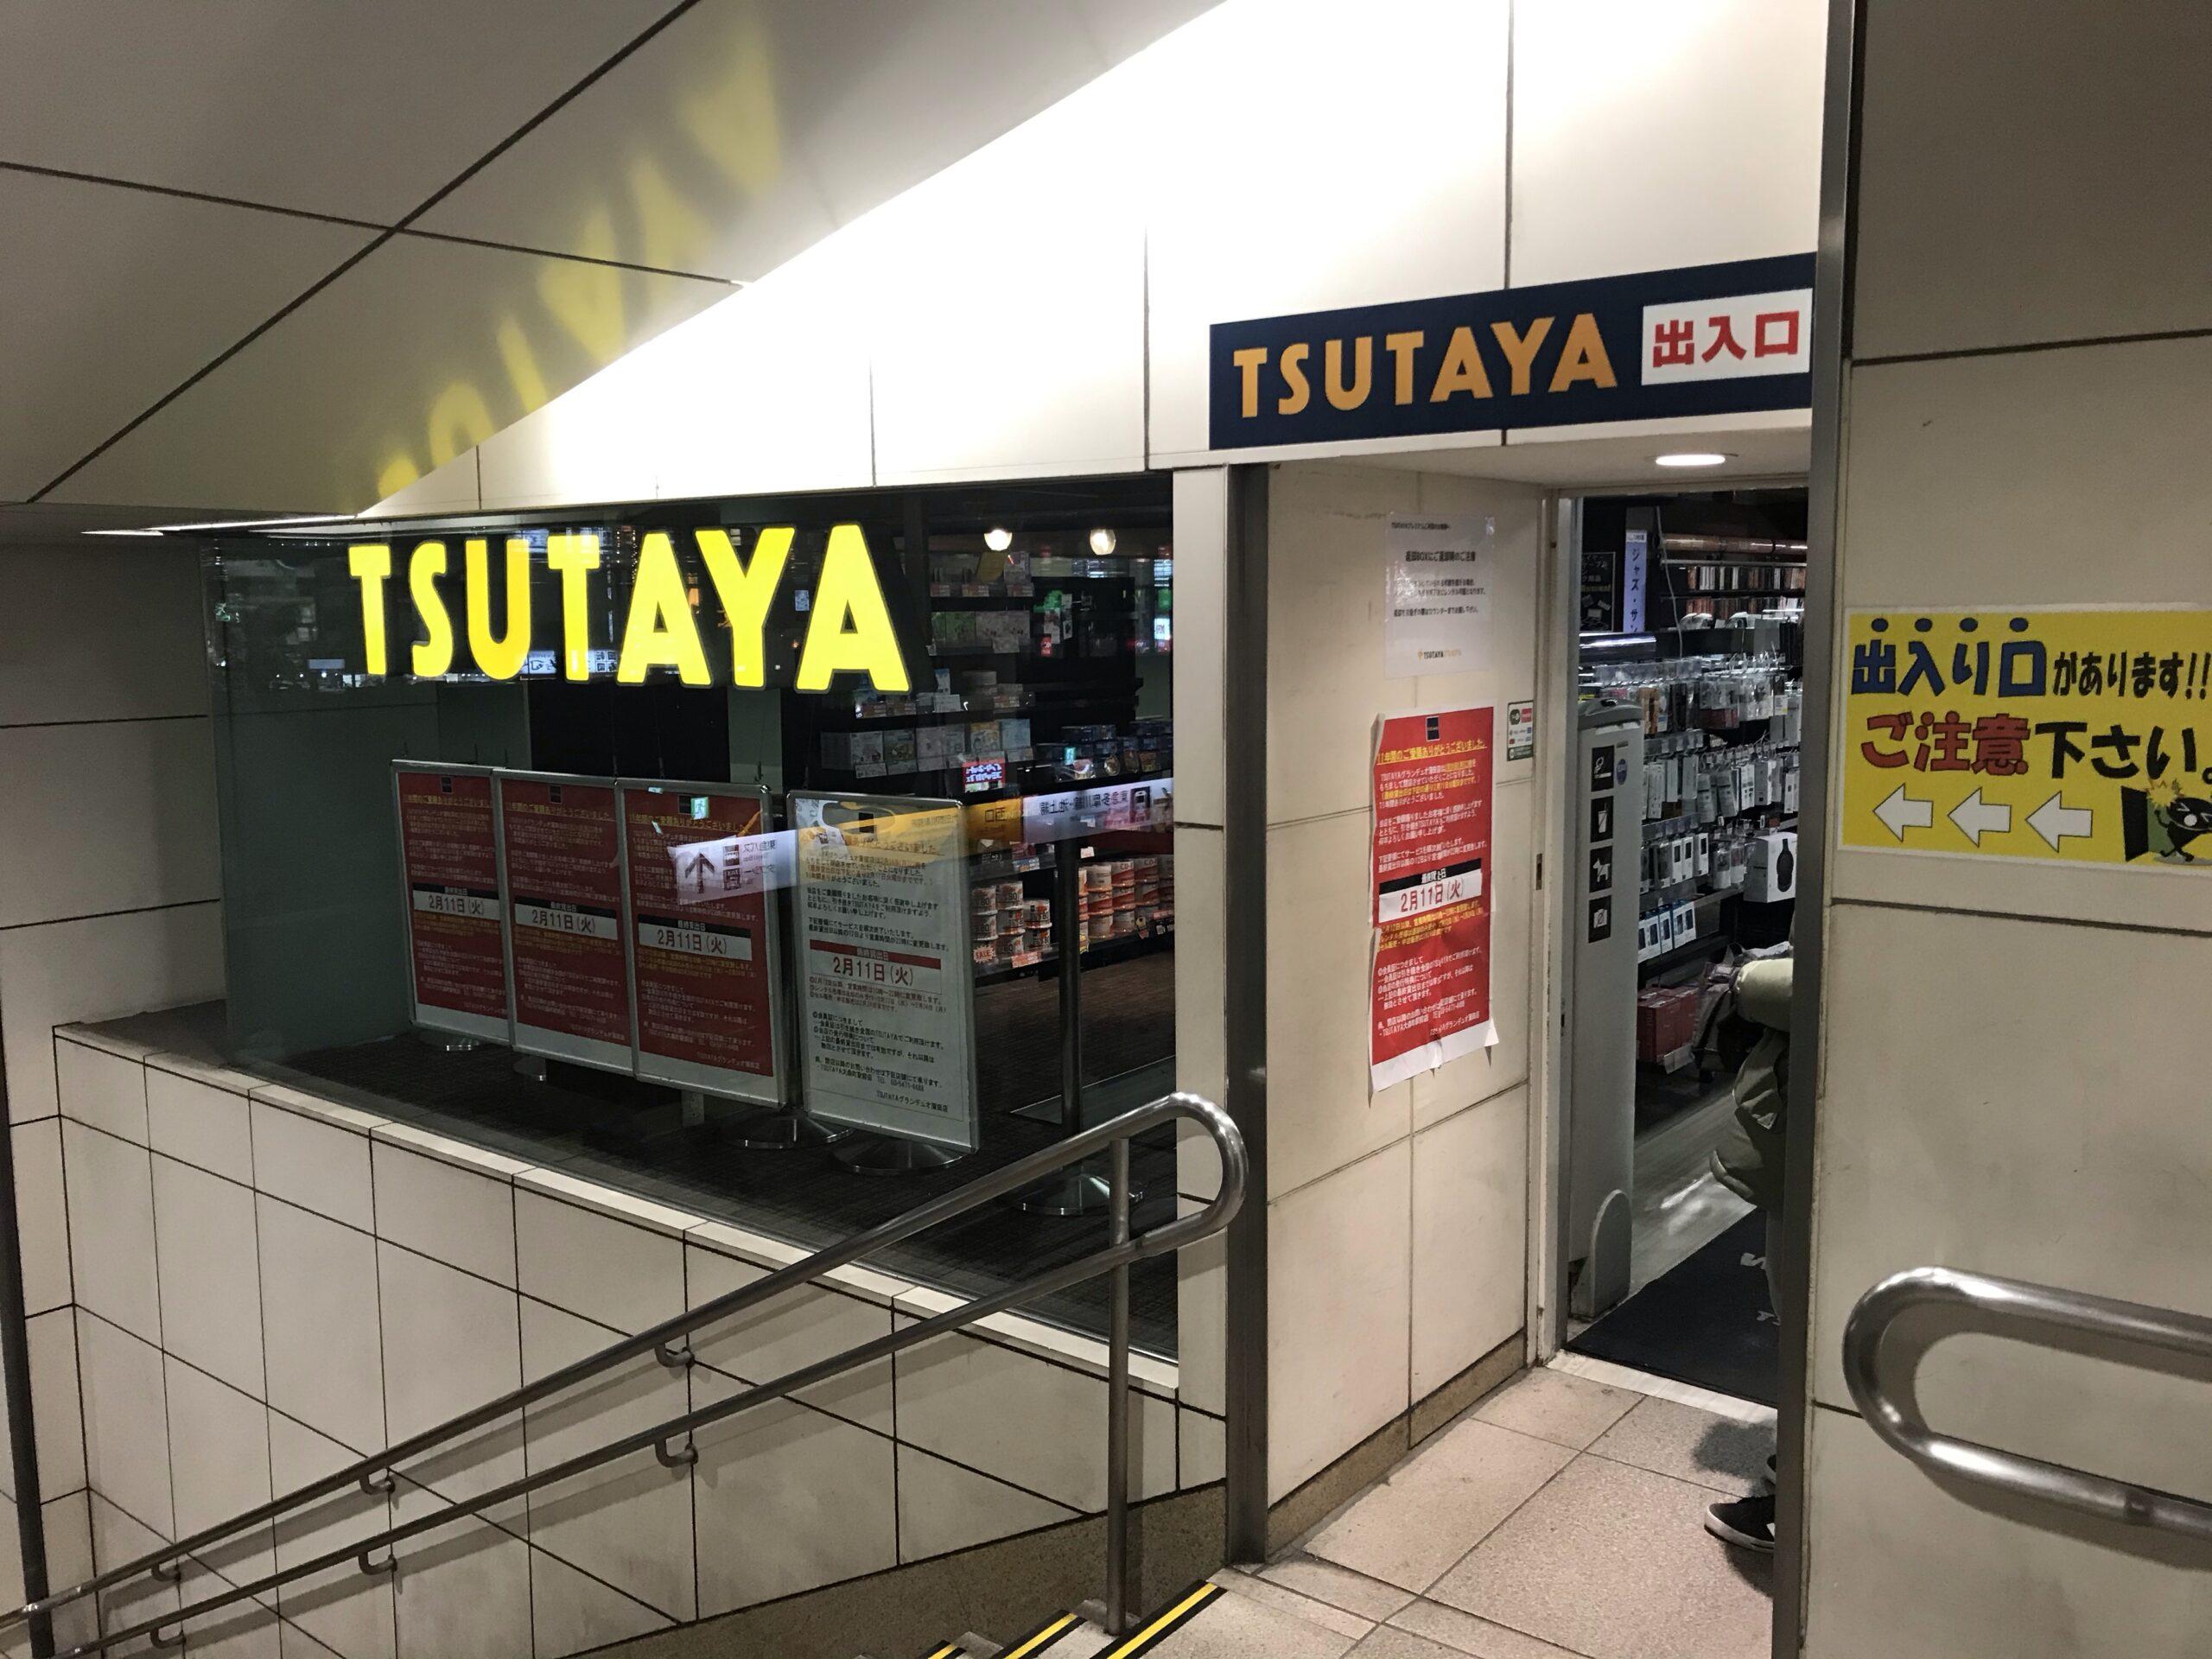 TSUTAYA 蒲田 閉店 外観